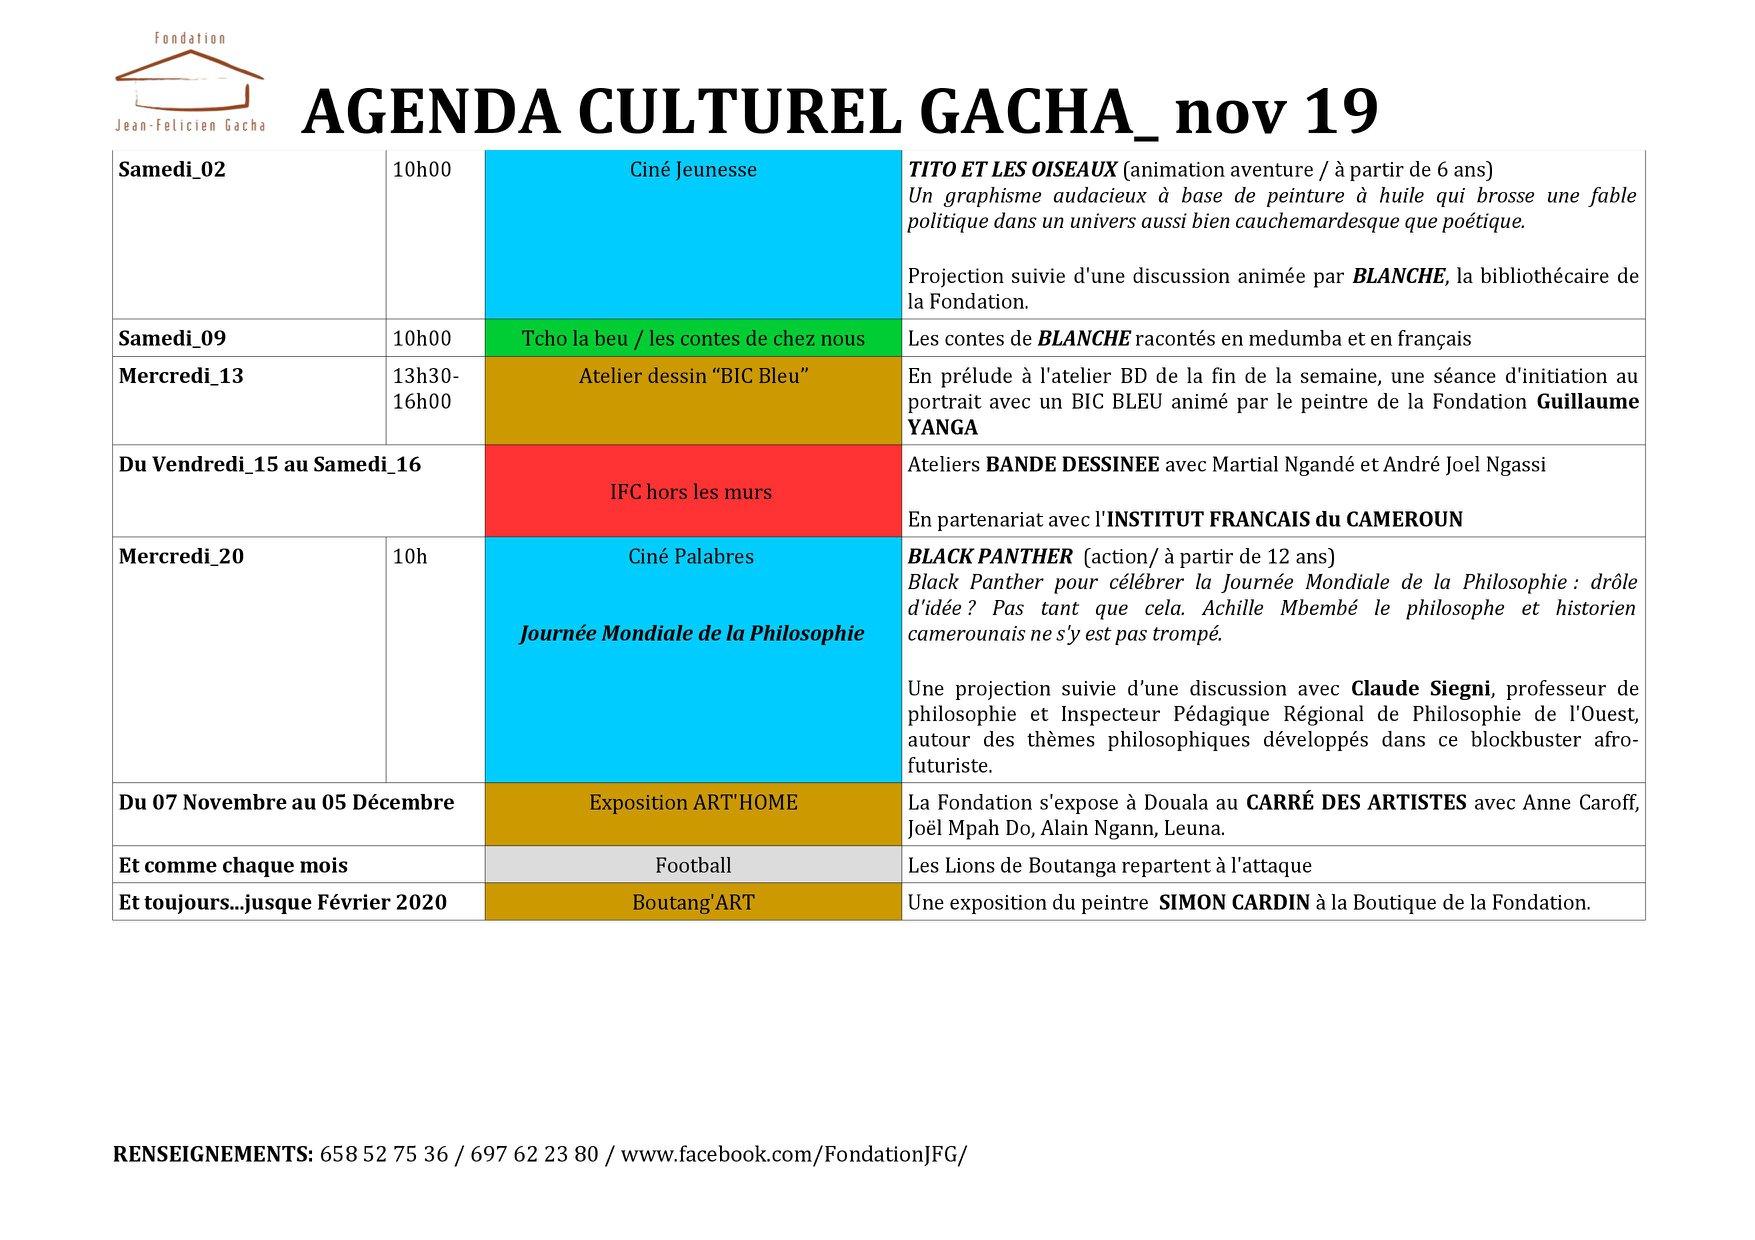 agenda culturel du mois de novembre